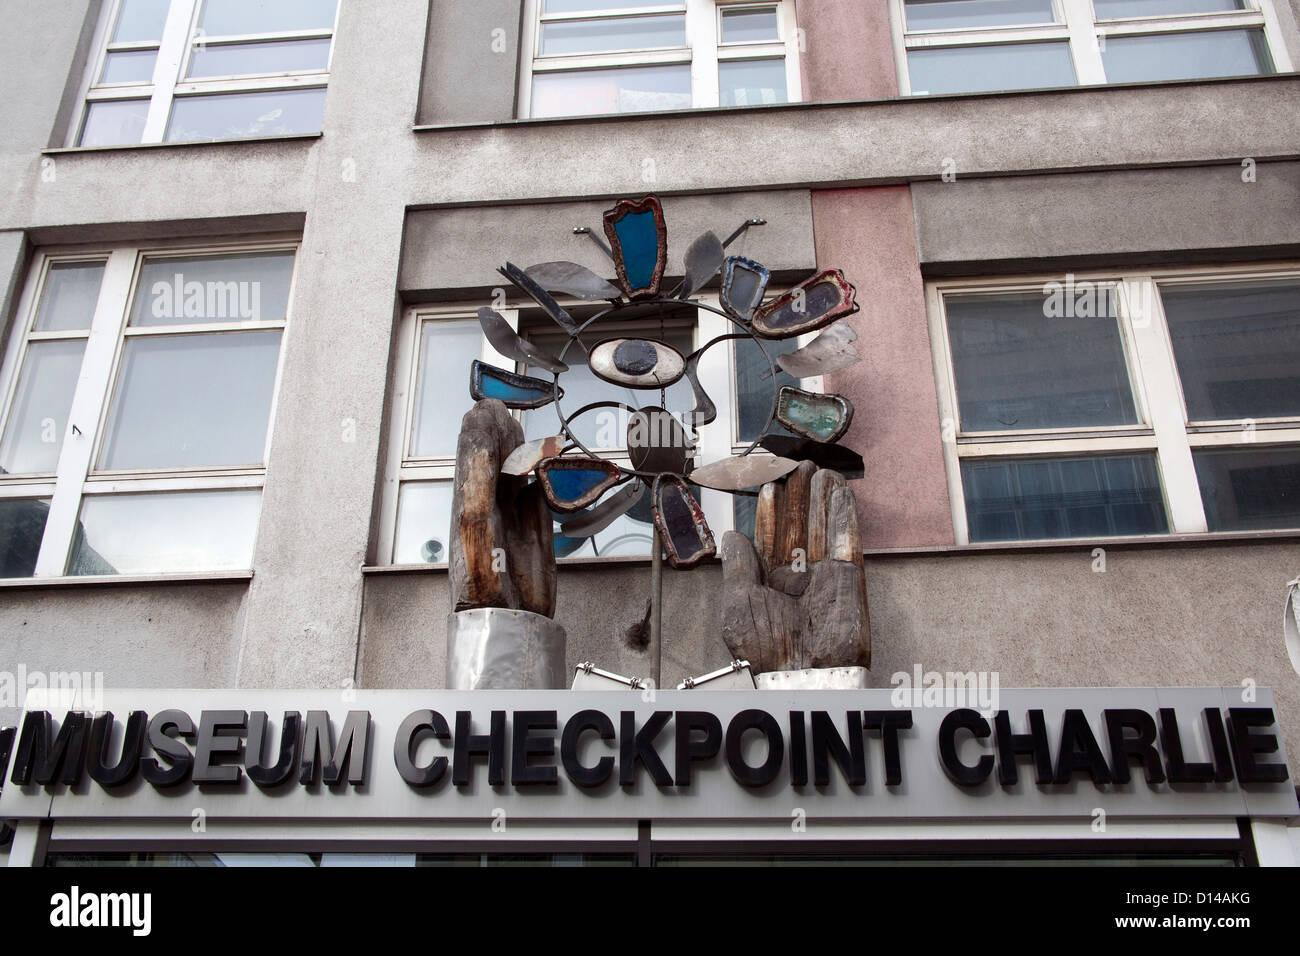 Museo Mauermuseum Checkpoint Charlie - Berlín - Alemania Imagen De Stock